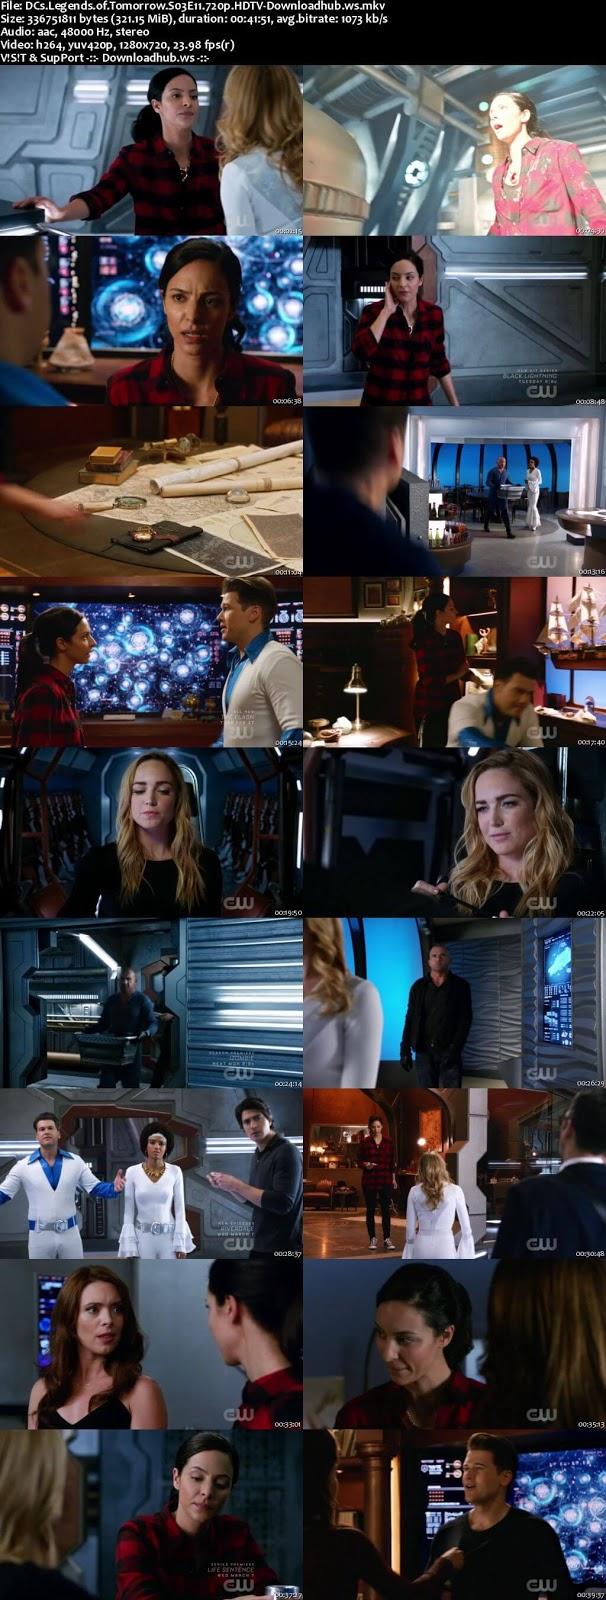 DCs Legends of Tomorrow S03E11 320MB HDTV 720p x264